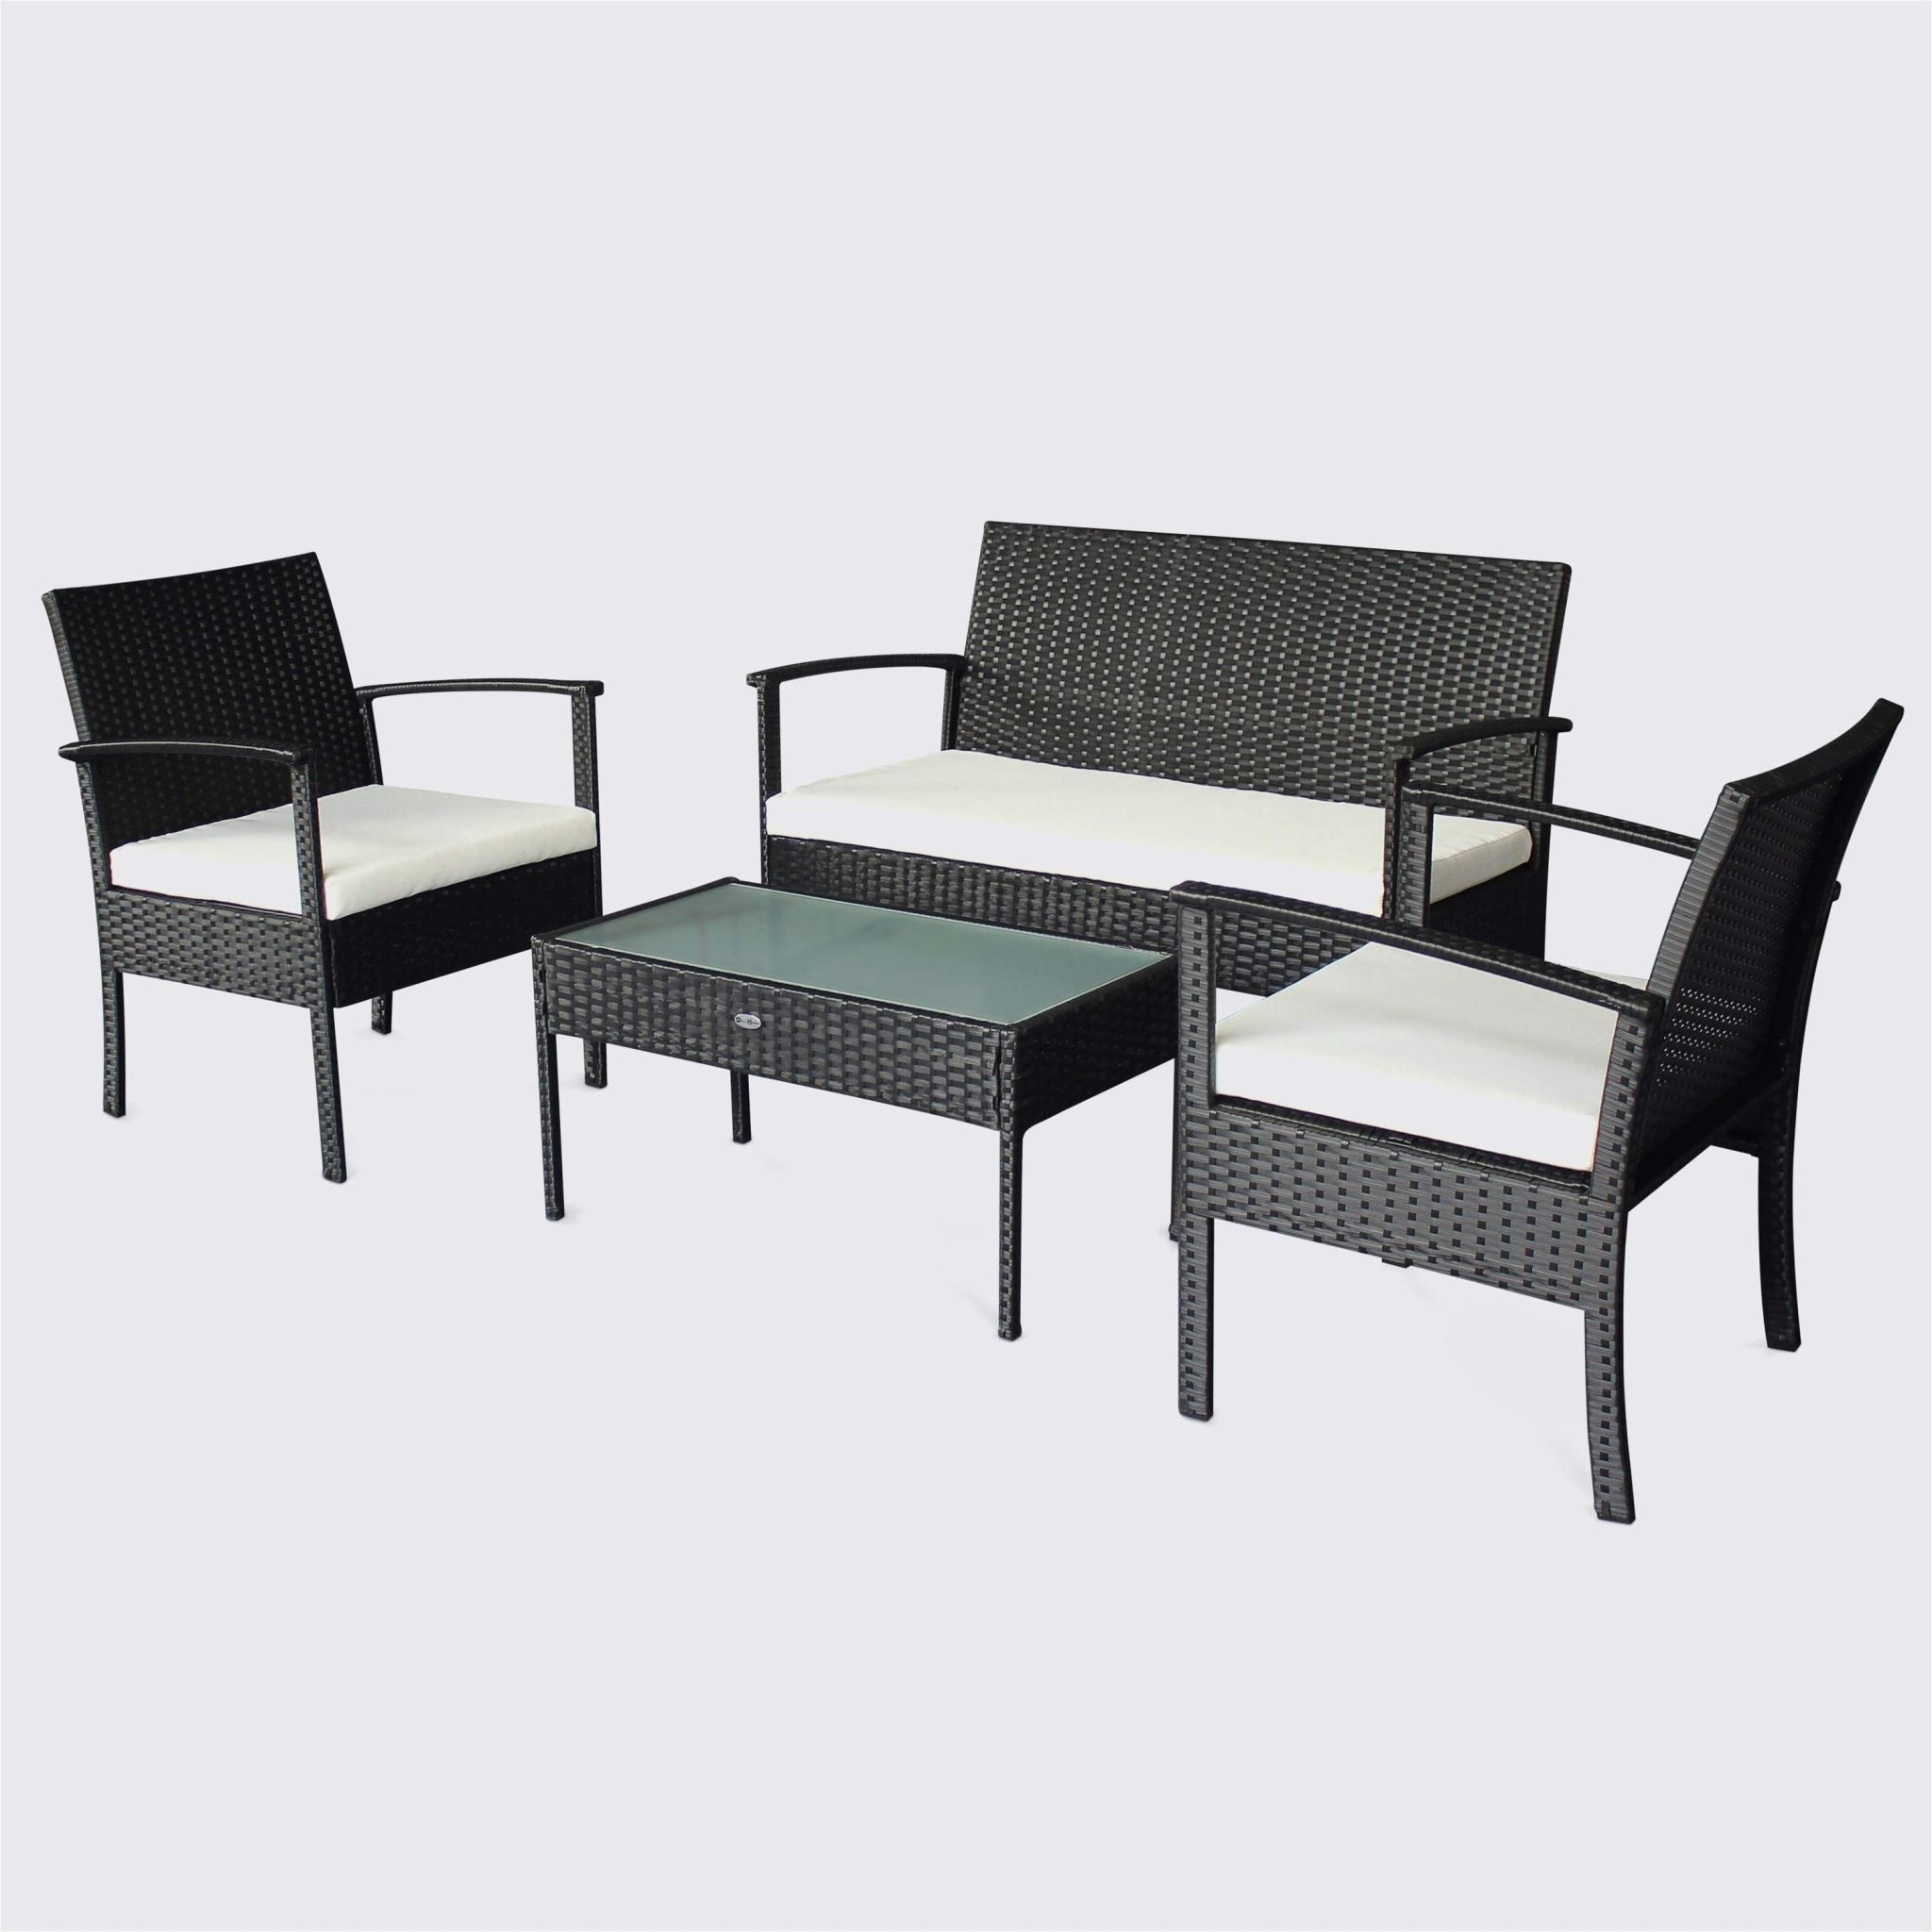 C Discount Salon De Jardin - Canalcncarauca intérieur Table De Jardin Discount